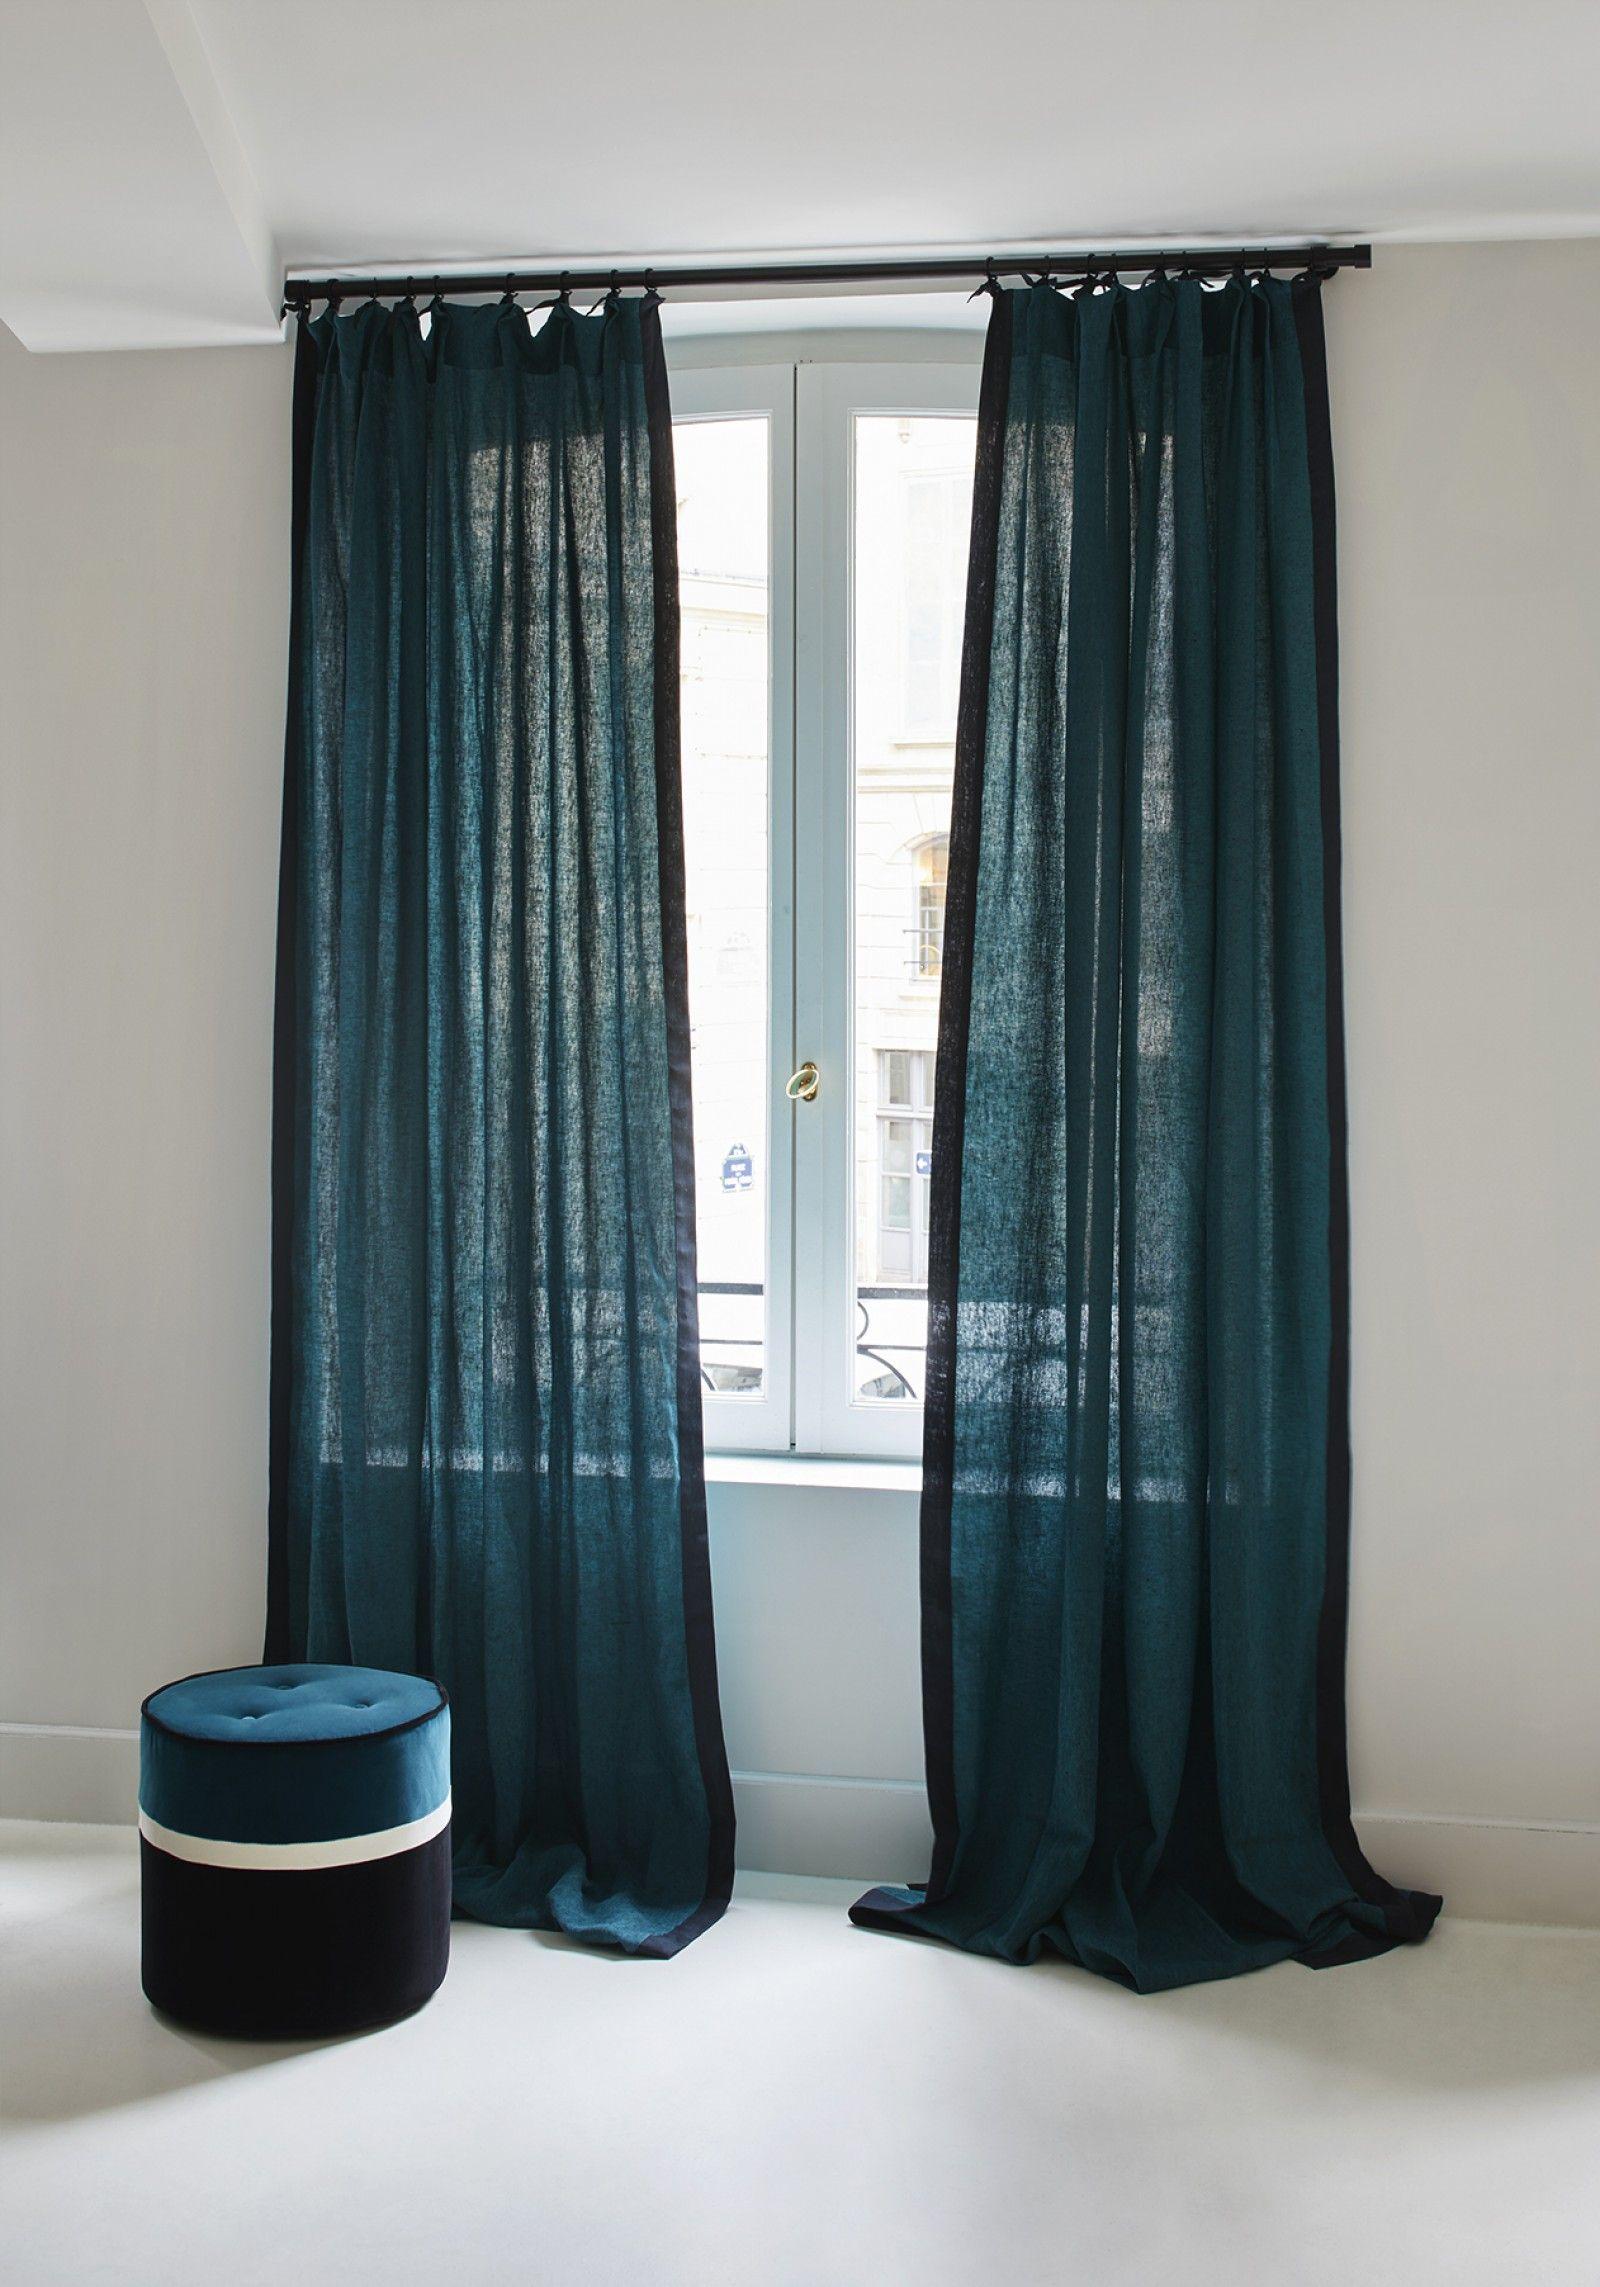 Rideaux Lin Ava Sarahlavoine Deco Design Inspiradeco Deco Rideaux Salon Idee Rideaux Rideaux Chambre